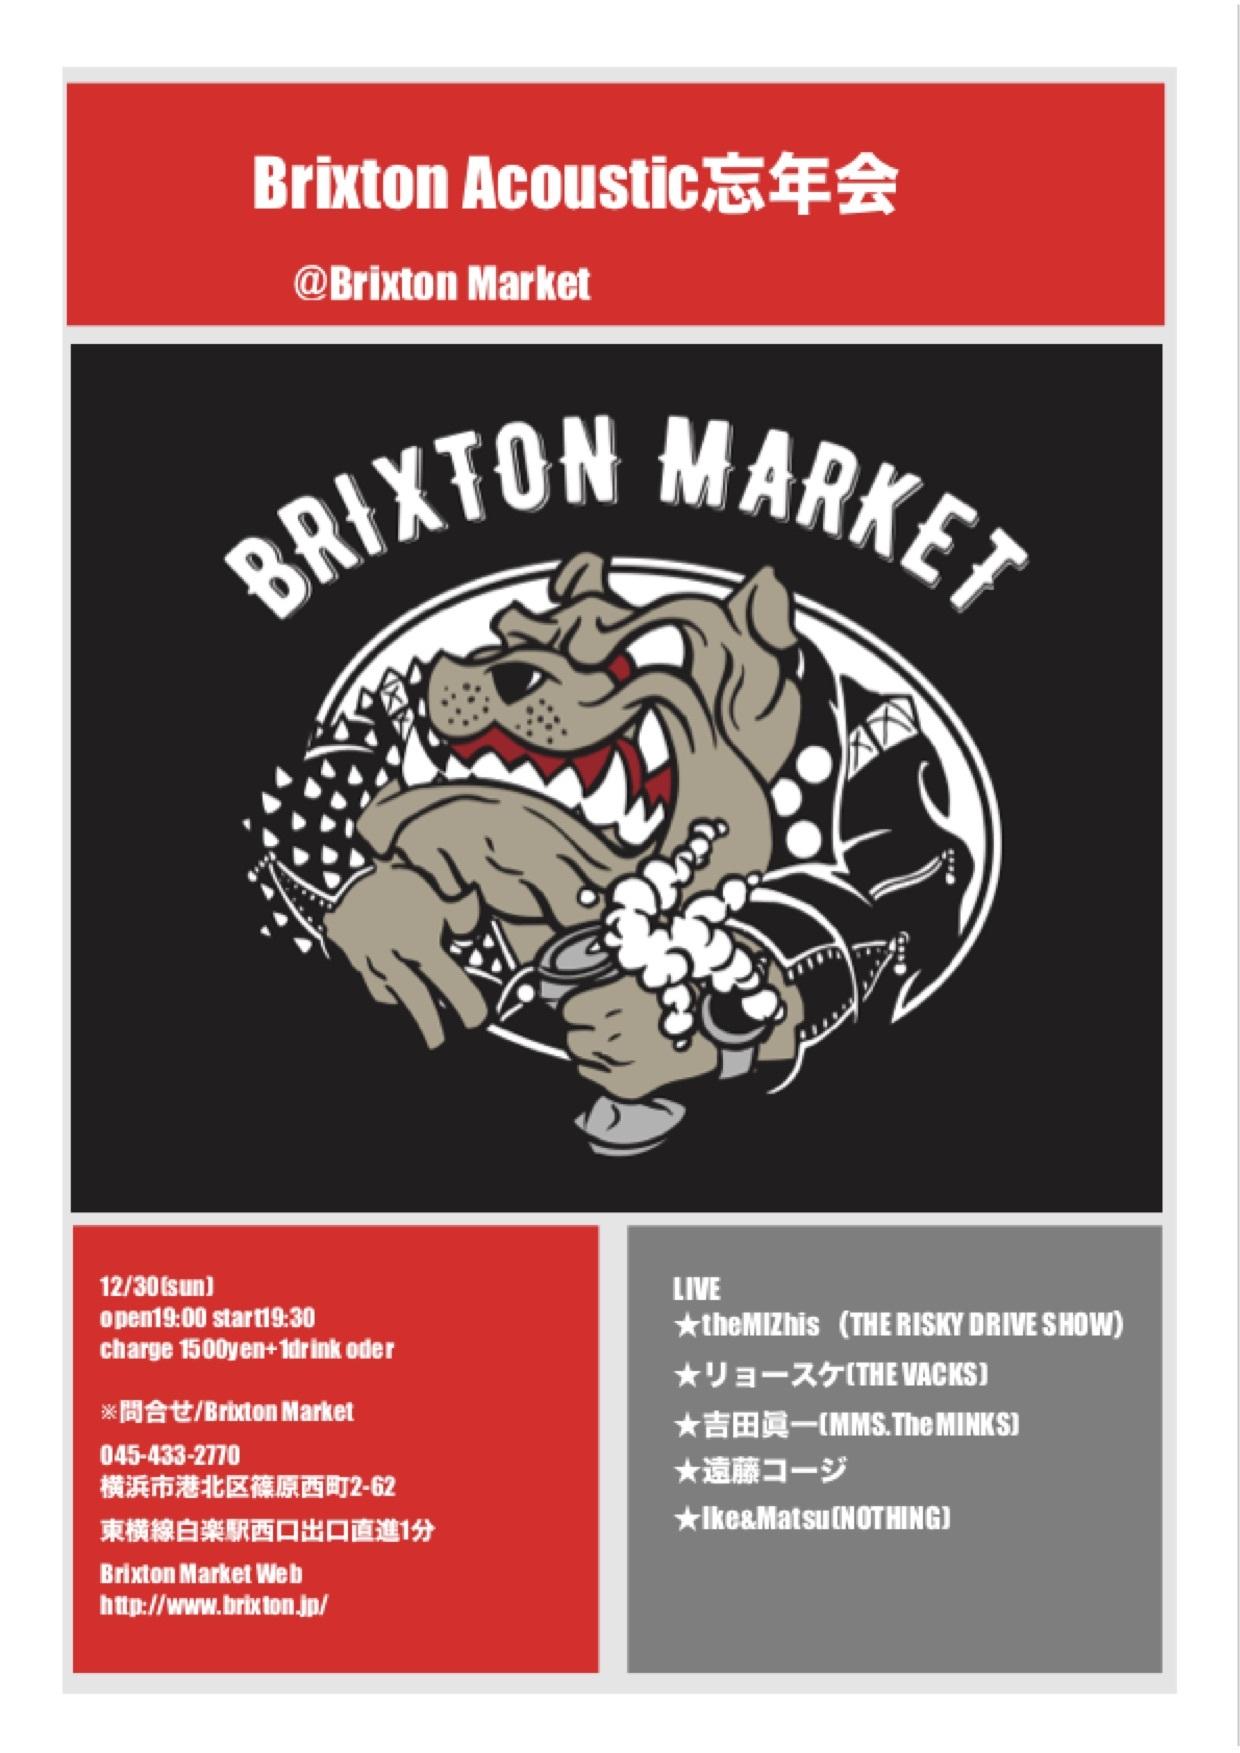 Brixton Acoustic忘年会スペシャル_d0134311_17075005.jpg